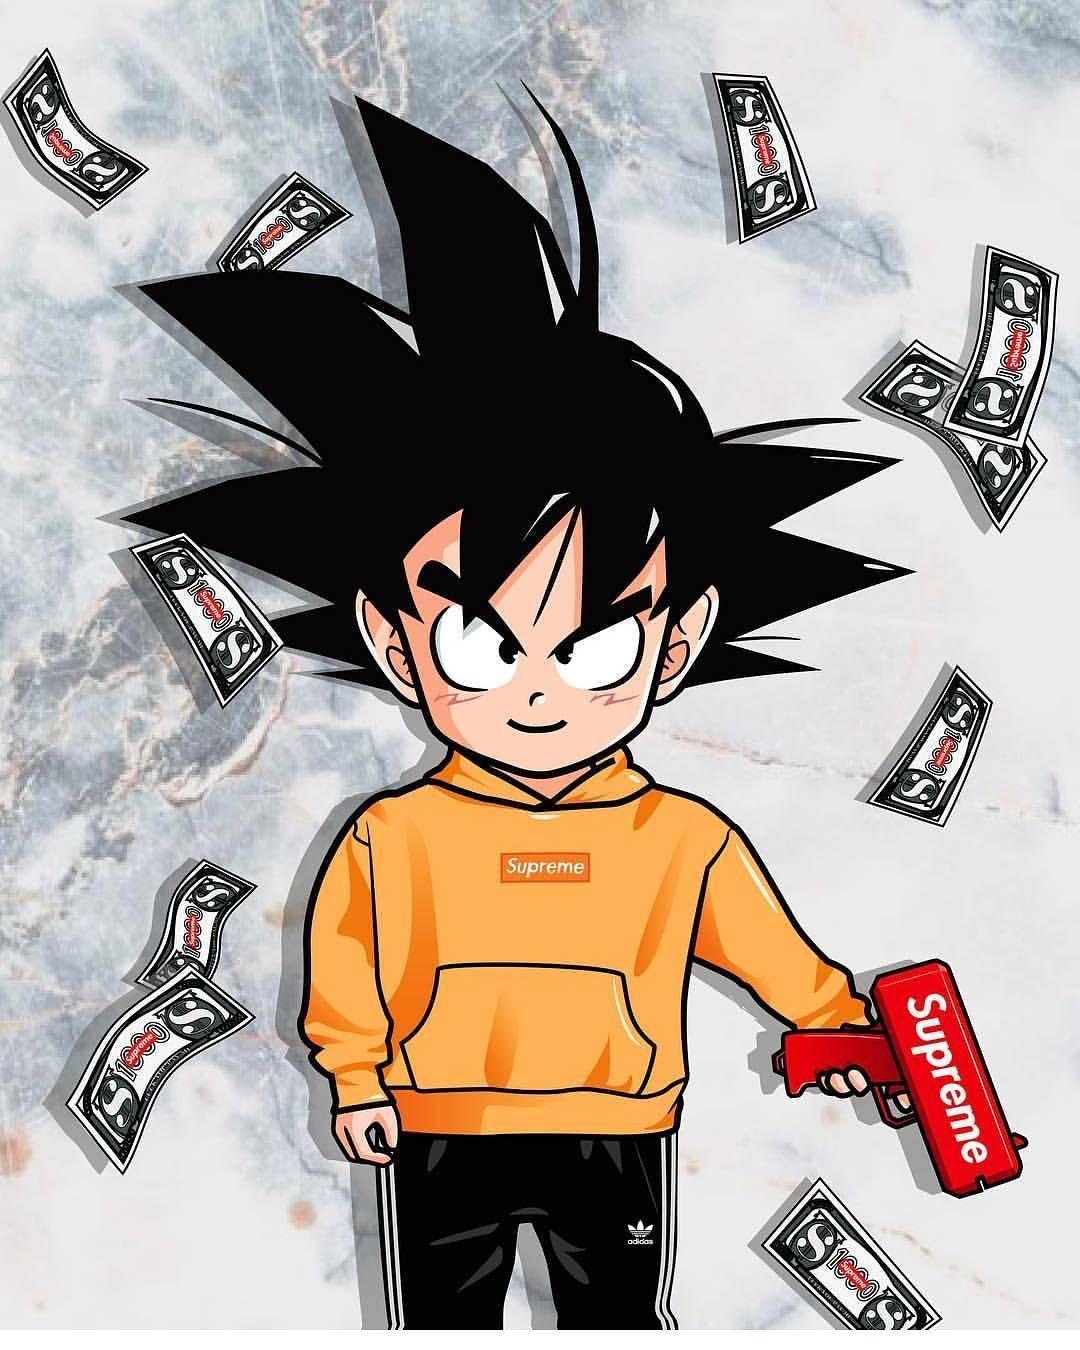 Goku Turnt Up Bellxyn Cultureandvibes Goku Wallpaper Anime Wallpaper Cartoon Wallpaper